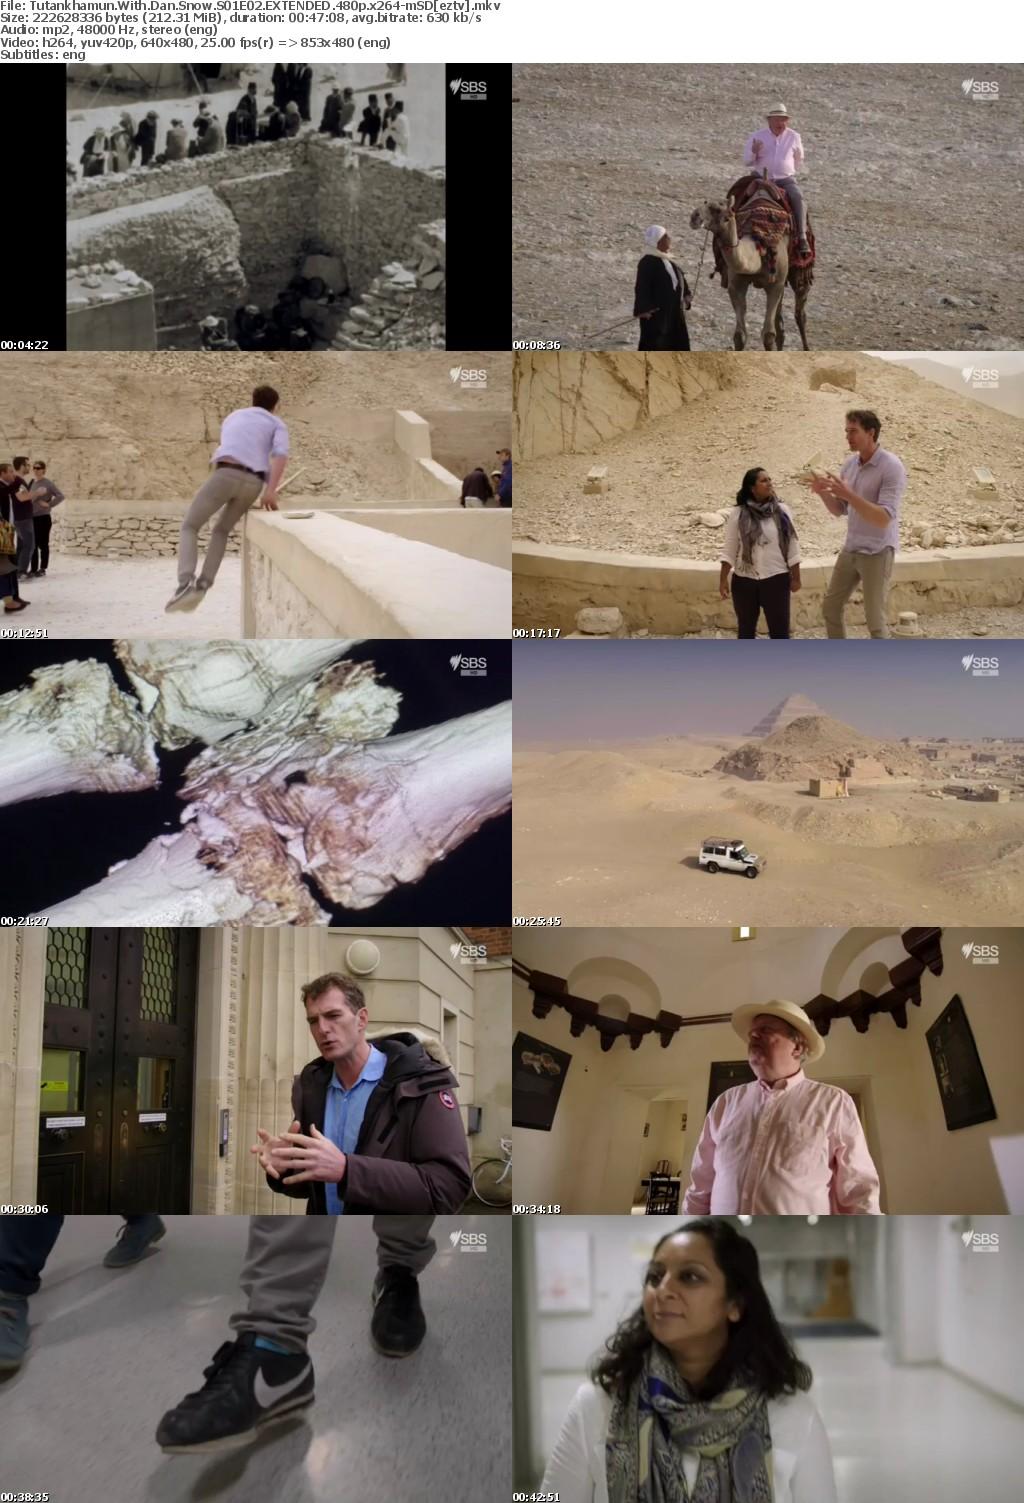 Tutankhamun With Dan Snow S01E02 EXTENDED 480p x264-mSD